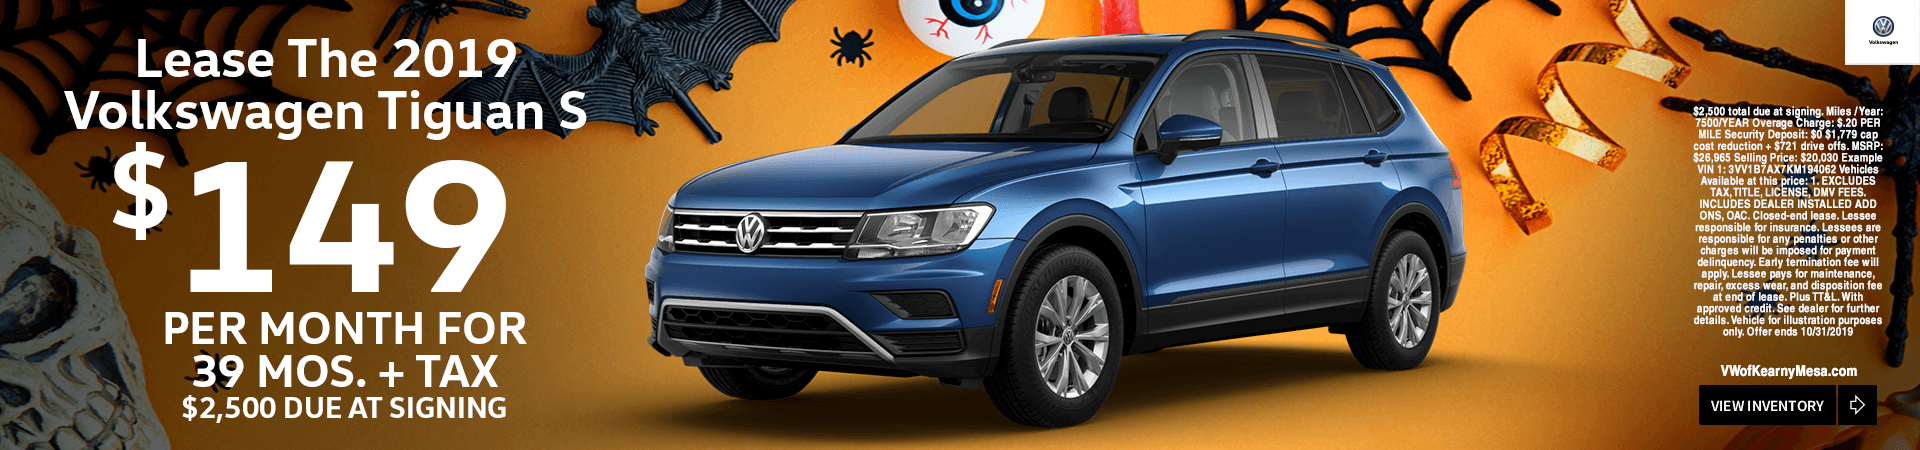 Vw Kearny Mesa >> Volkswagen of Kearny Mesa | Car Dealership Serving San Diego